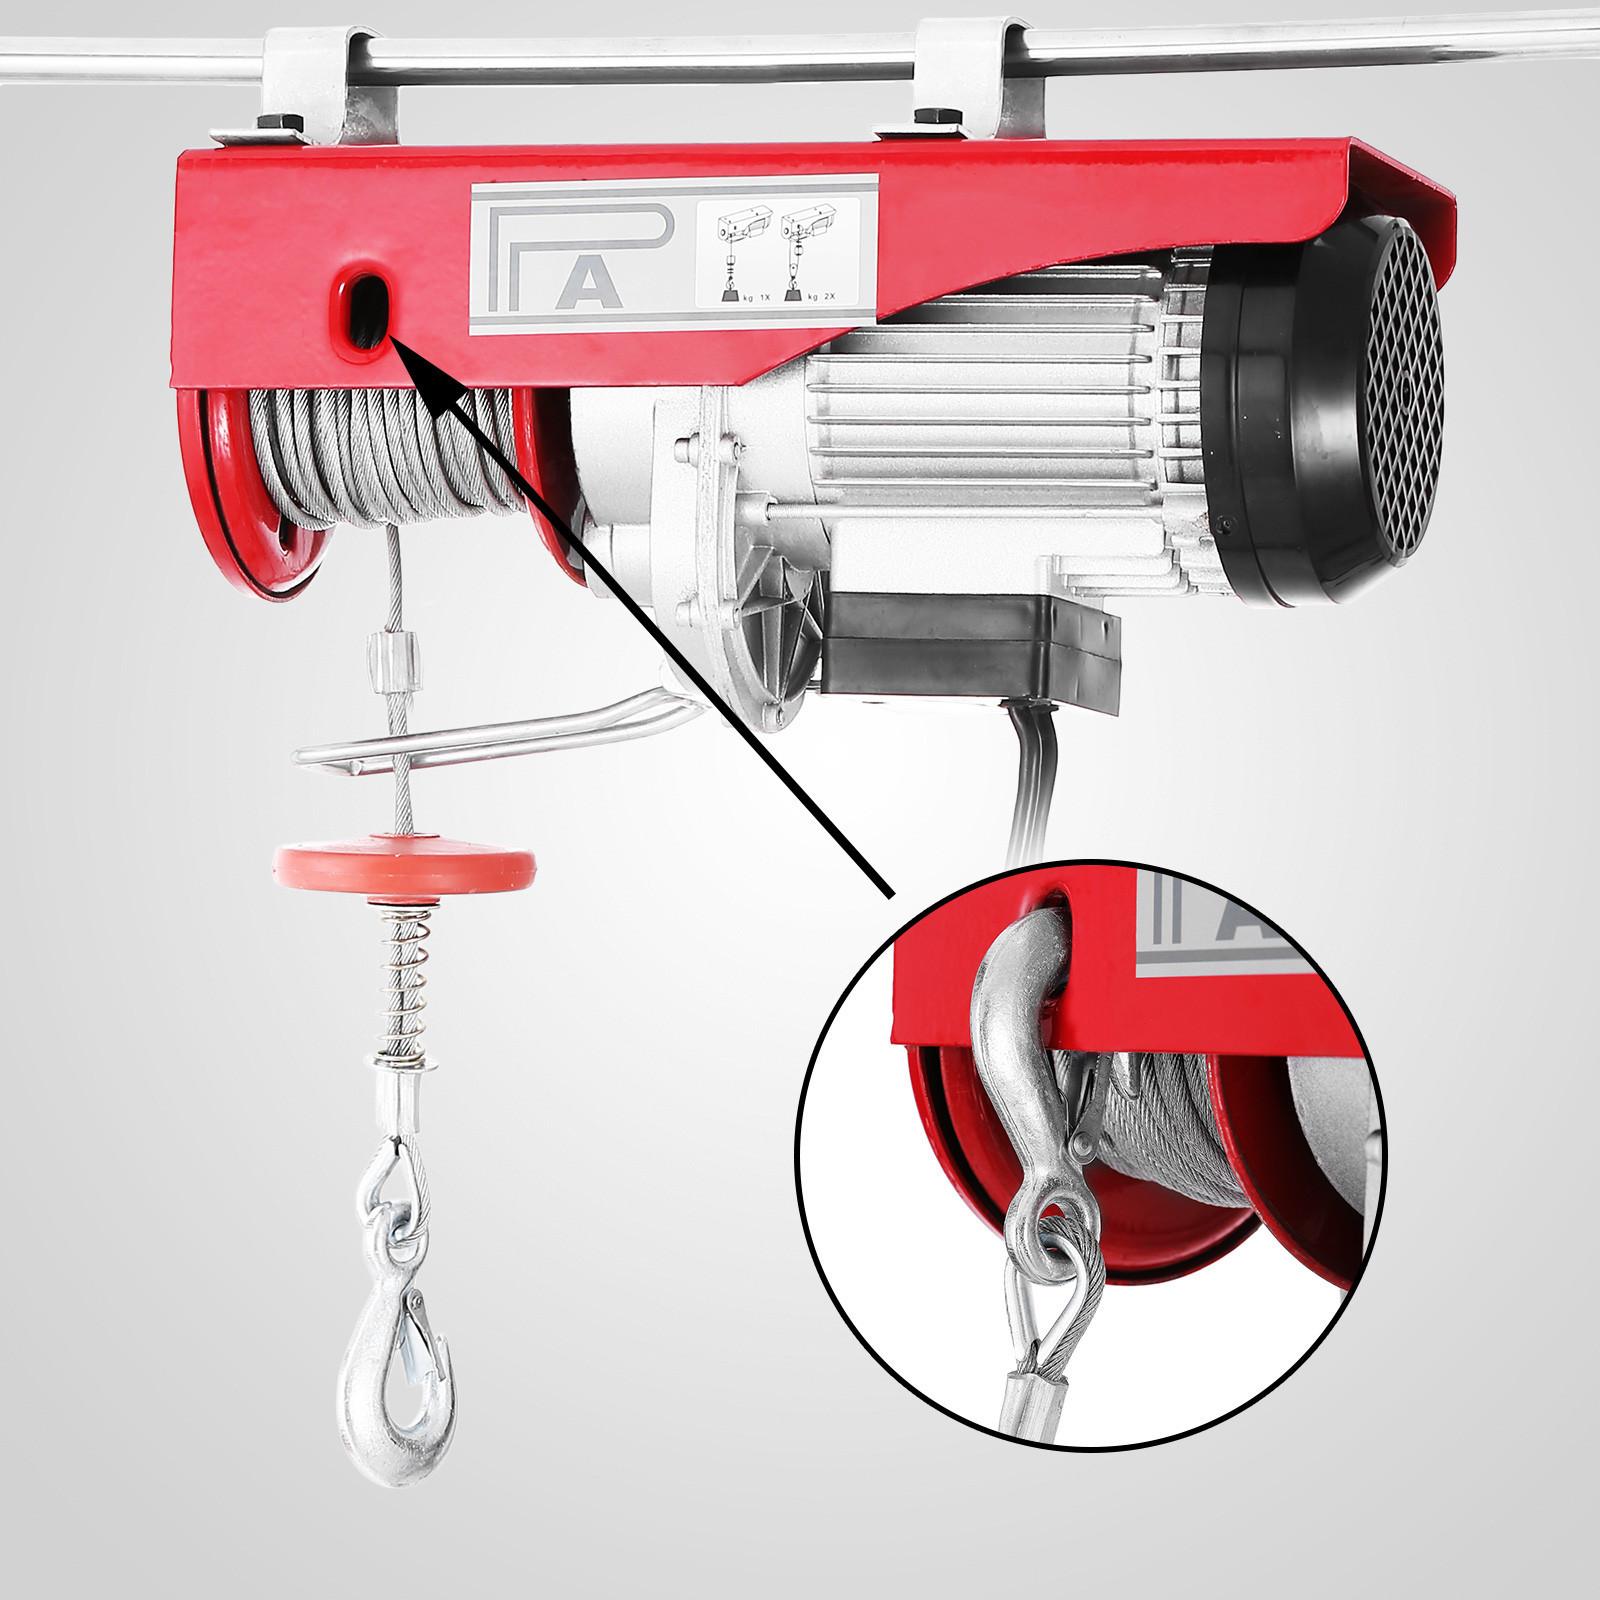 100kg-900kg-Electric-Hoist-Winch-Lifting-Engine-Crane-Cable-Lift-Hook-Garage miniature 24